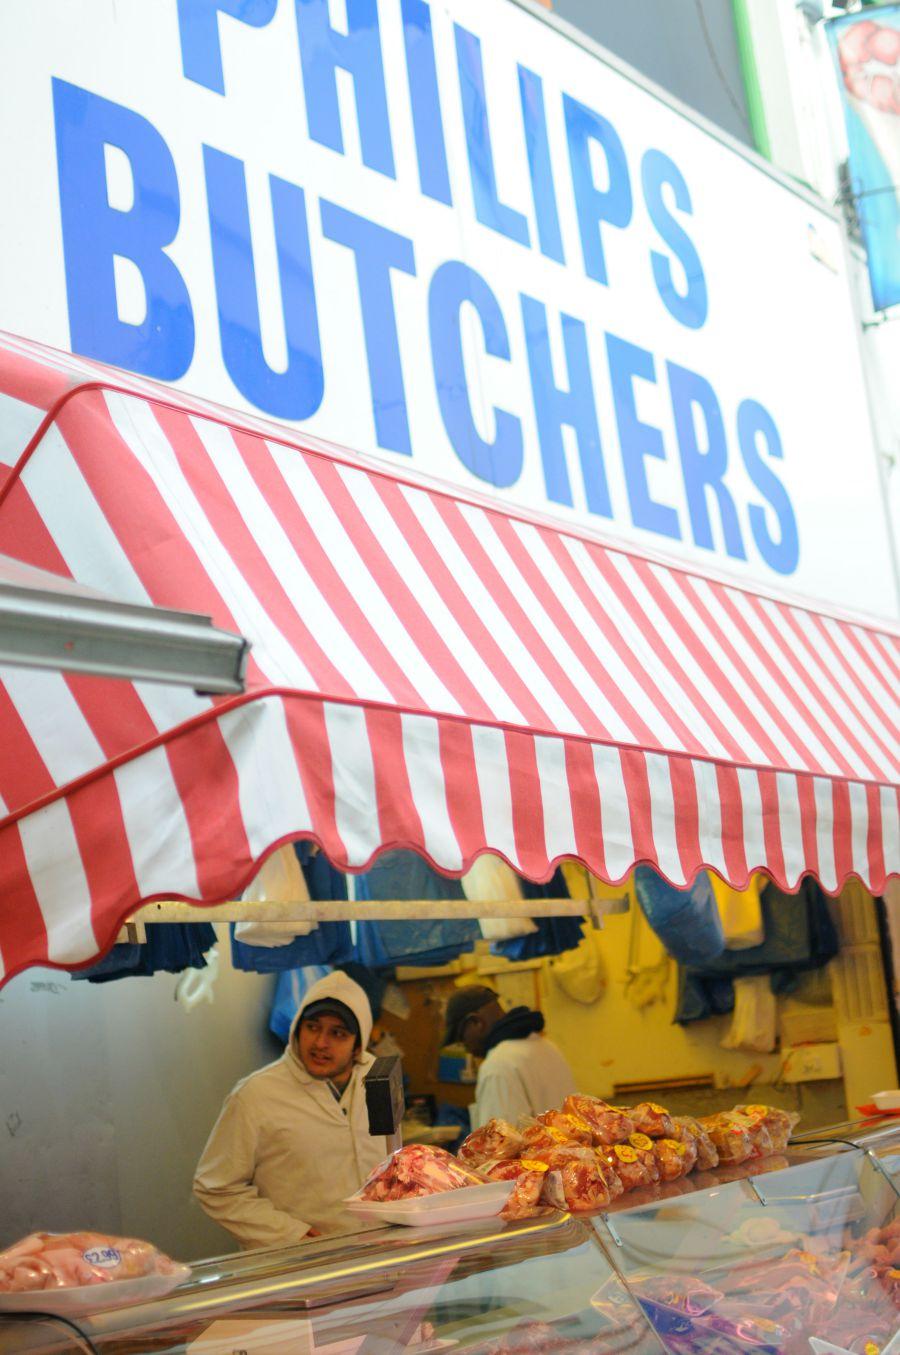 brixton butcher